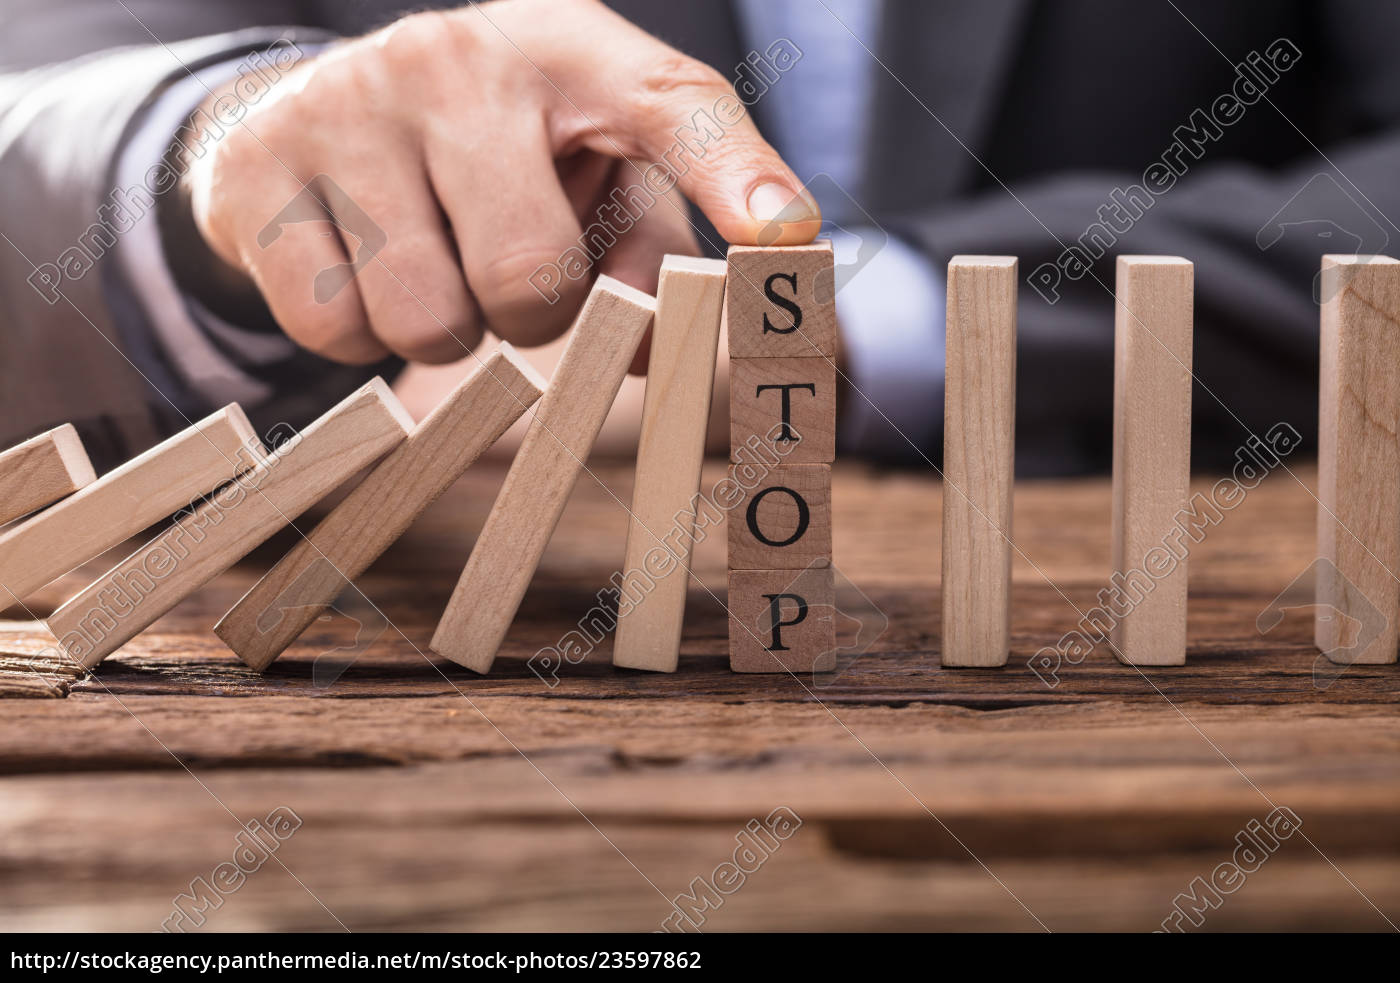 businessperson's, finger, stopping, falling, dominos - 23597862